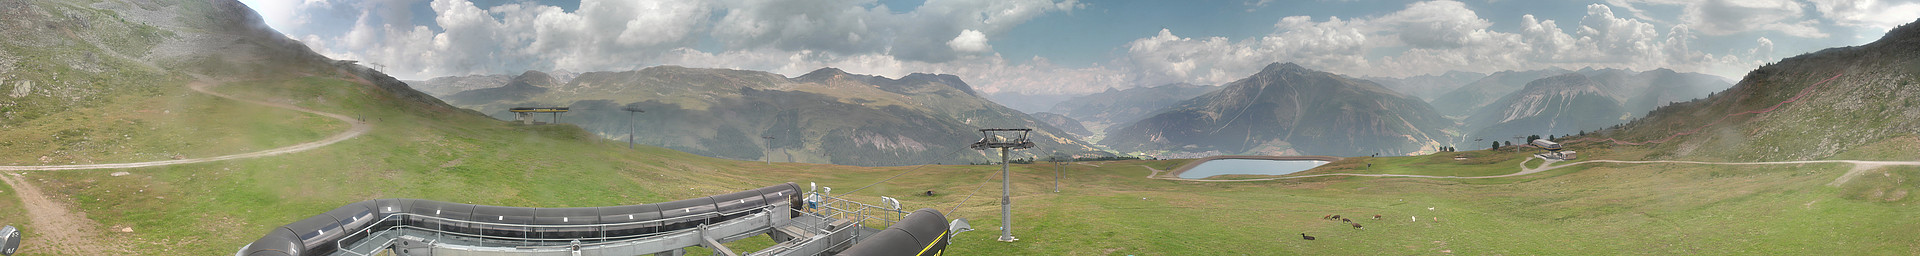 Skigebiet Schöneben Bergstation © www.schoeneben.it